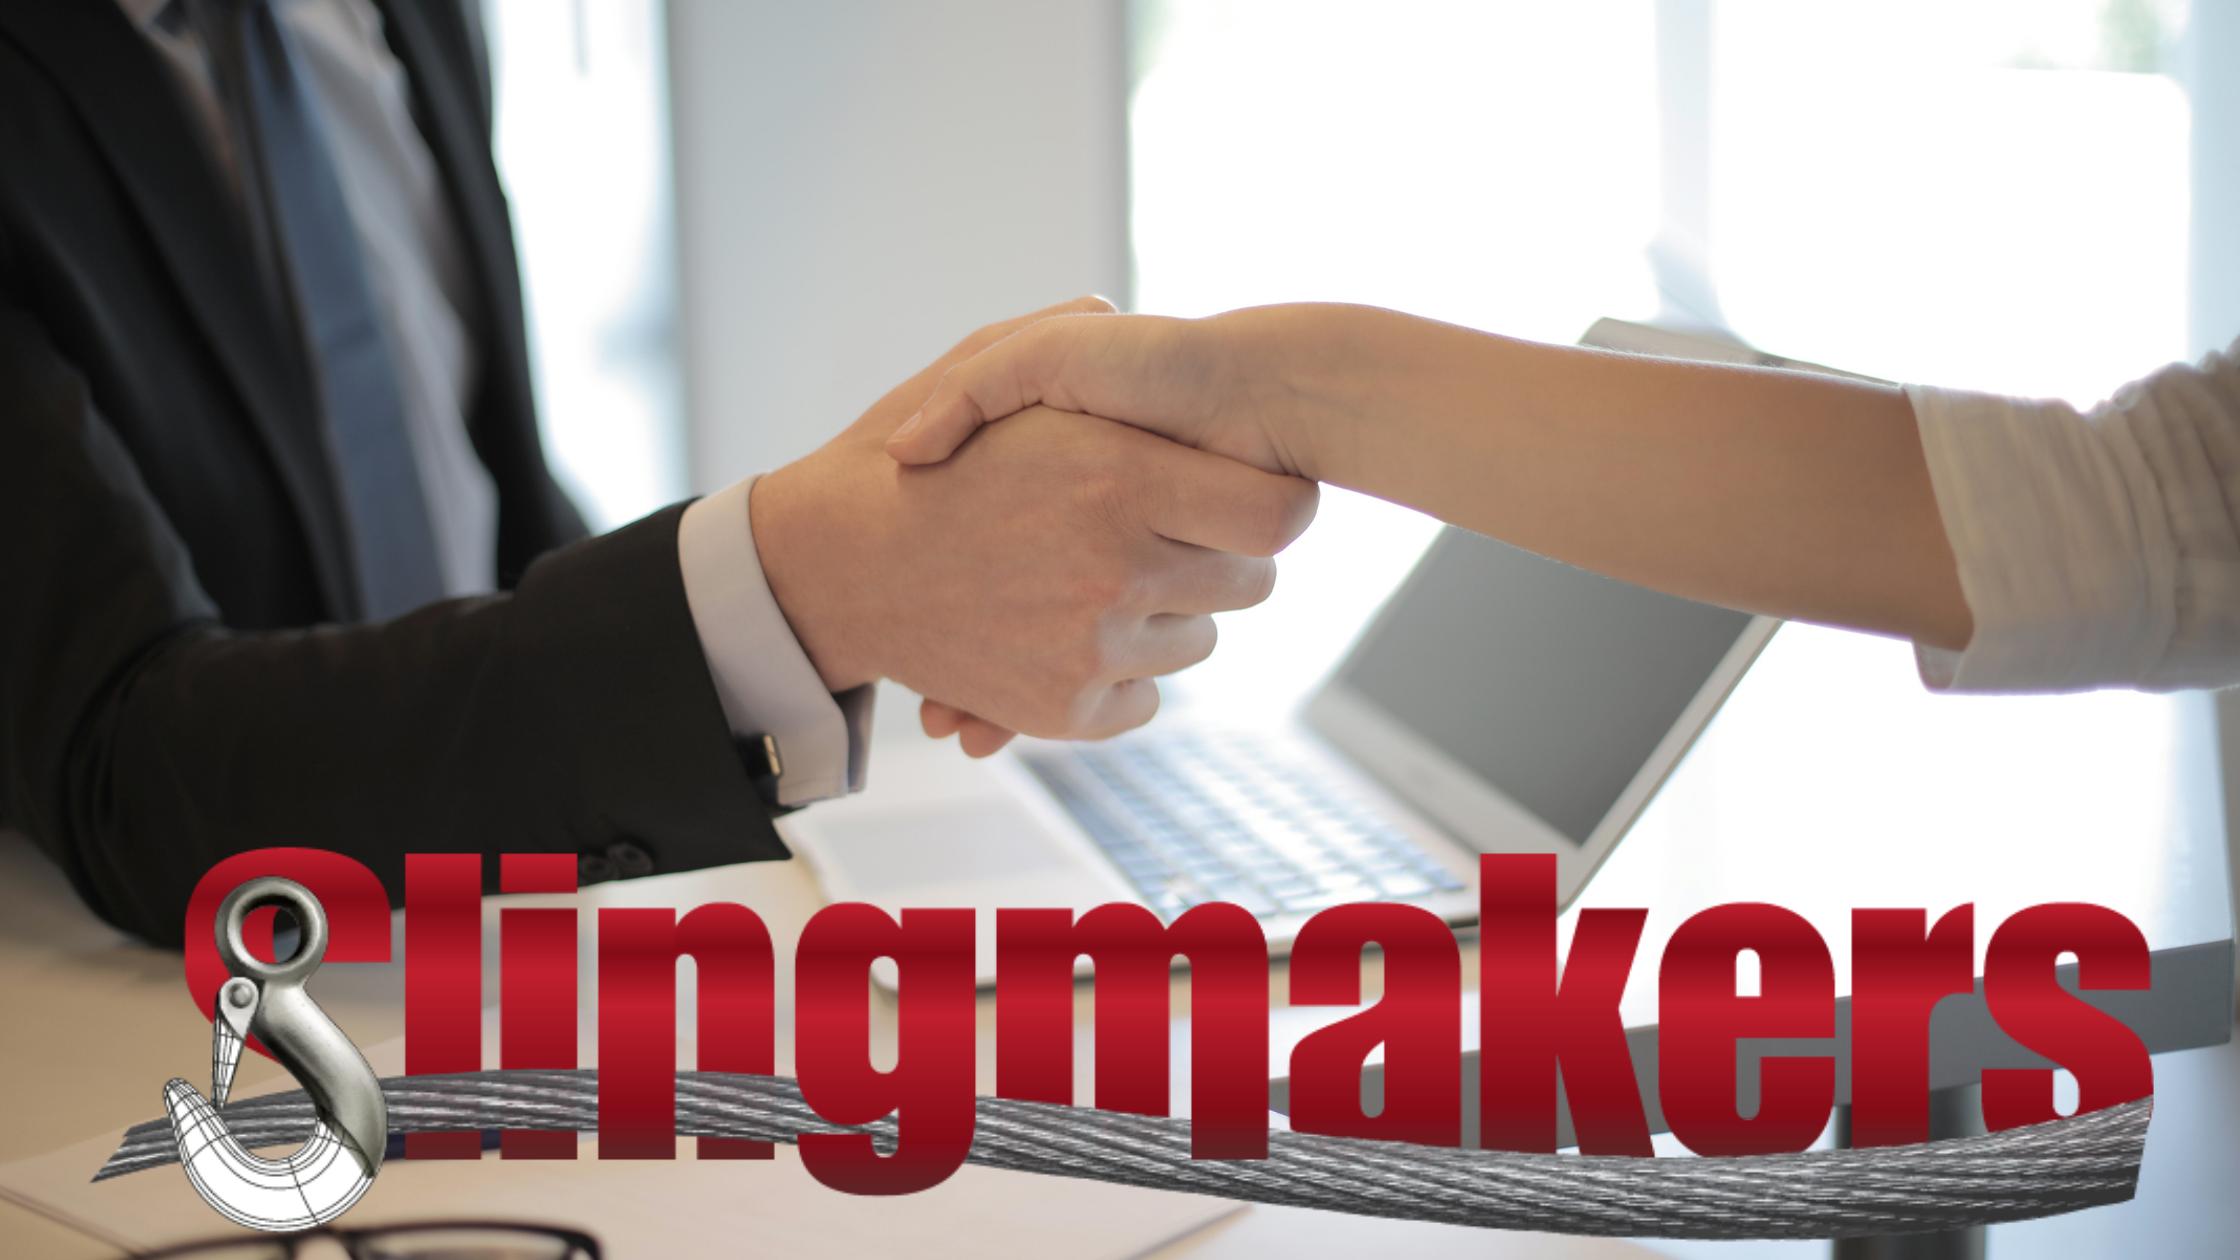 AWRF SlingMakers Blog Banners